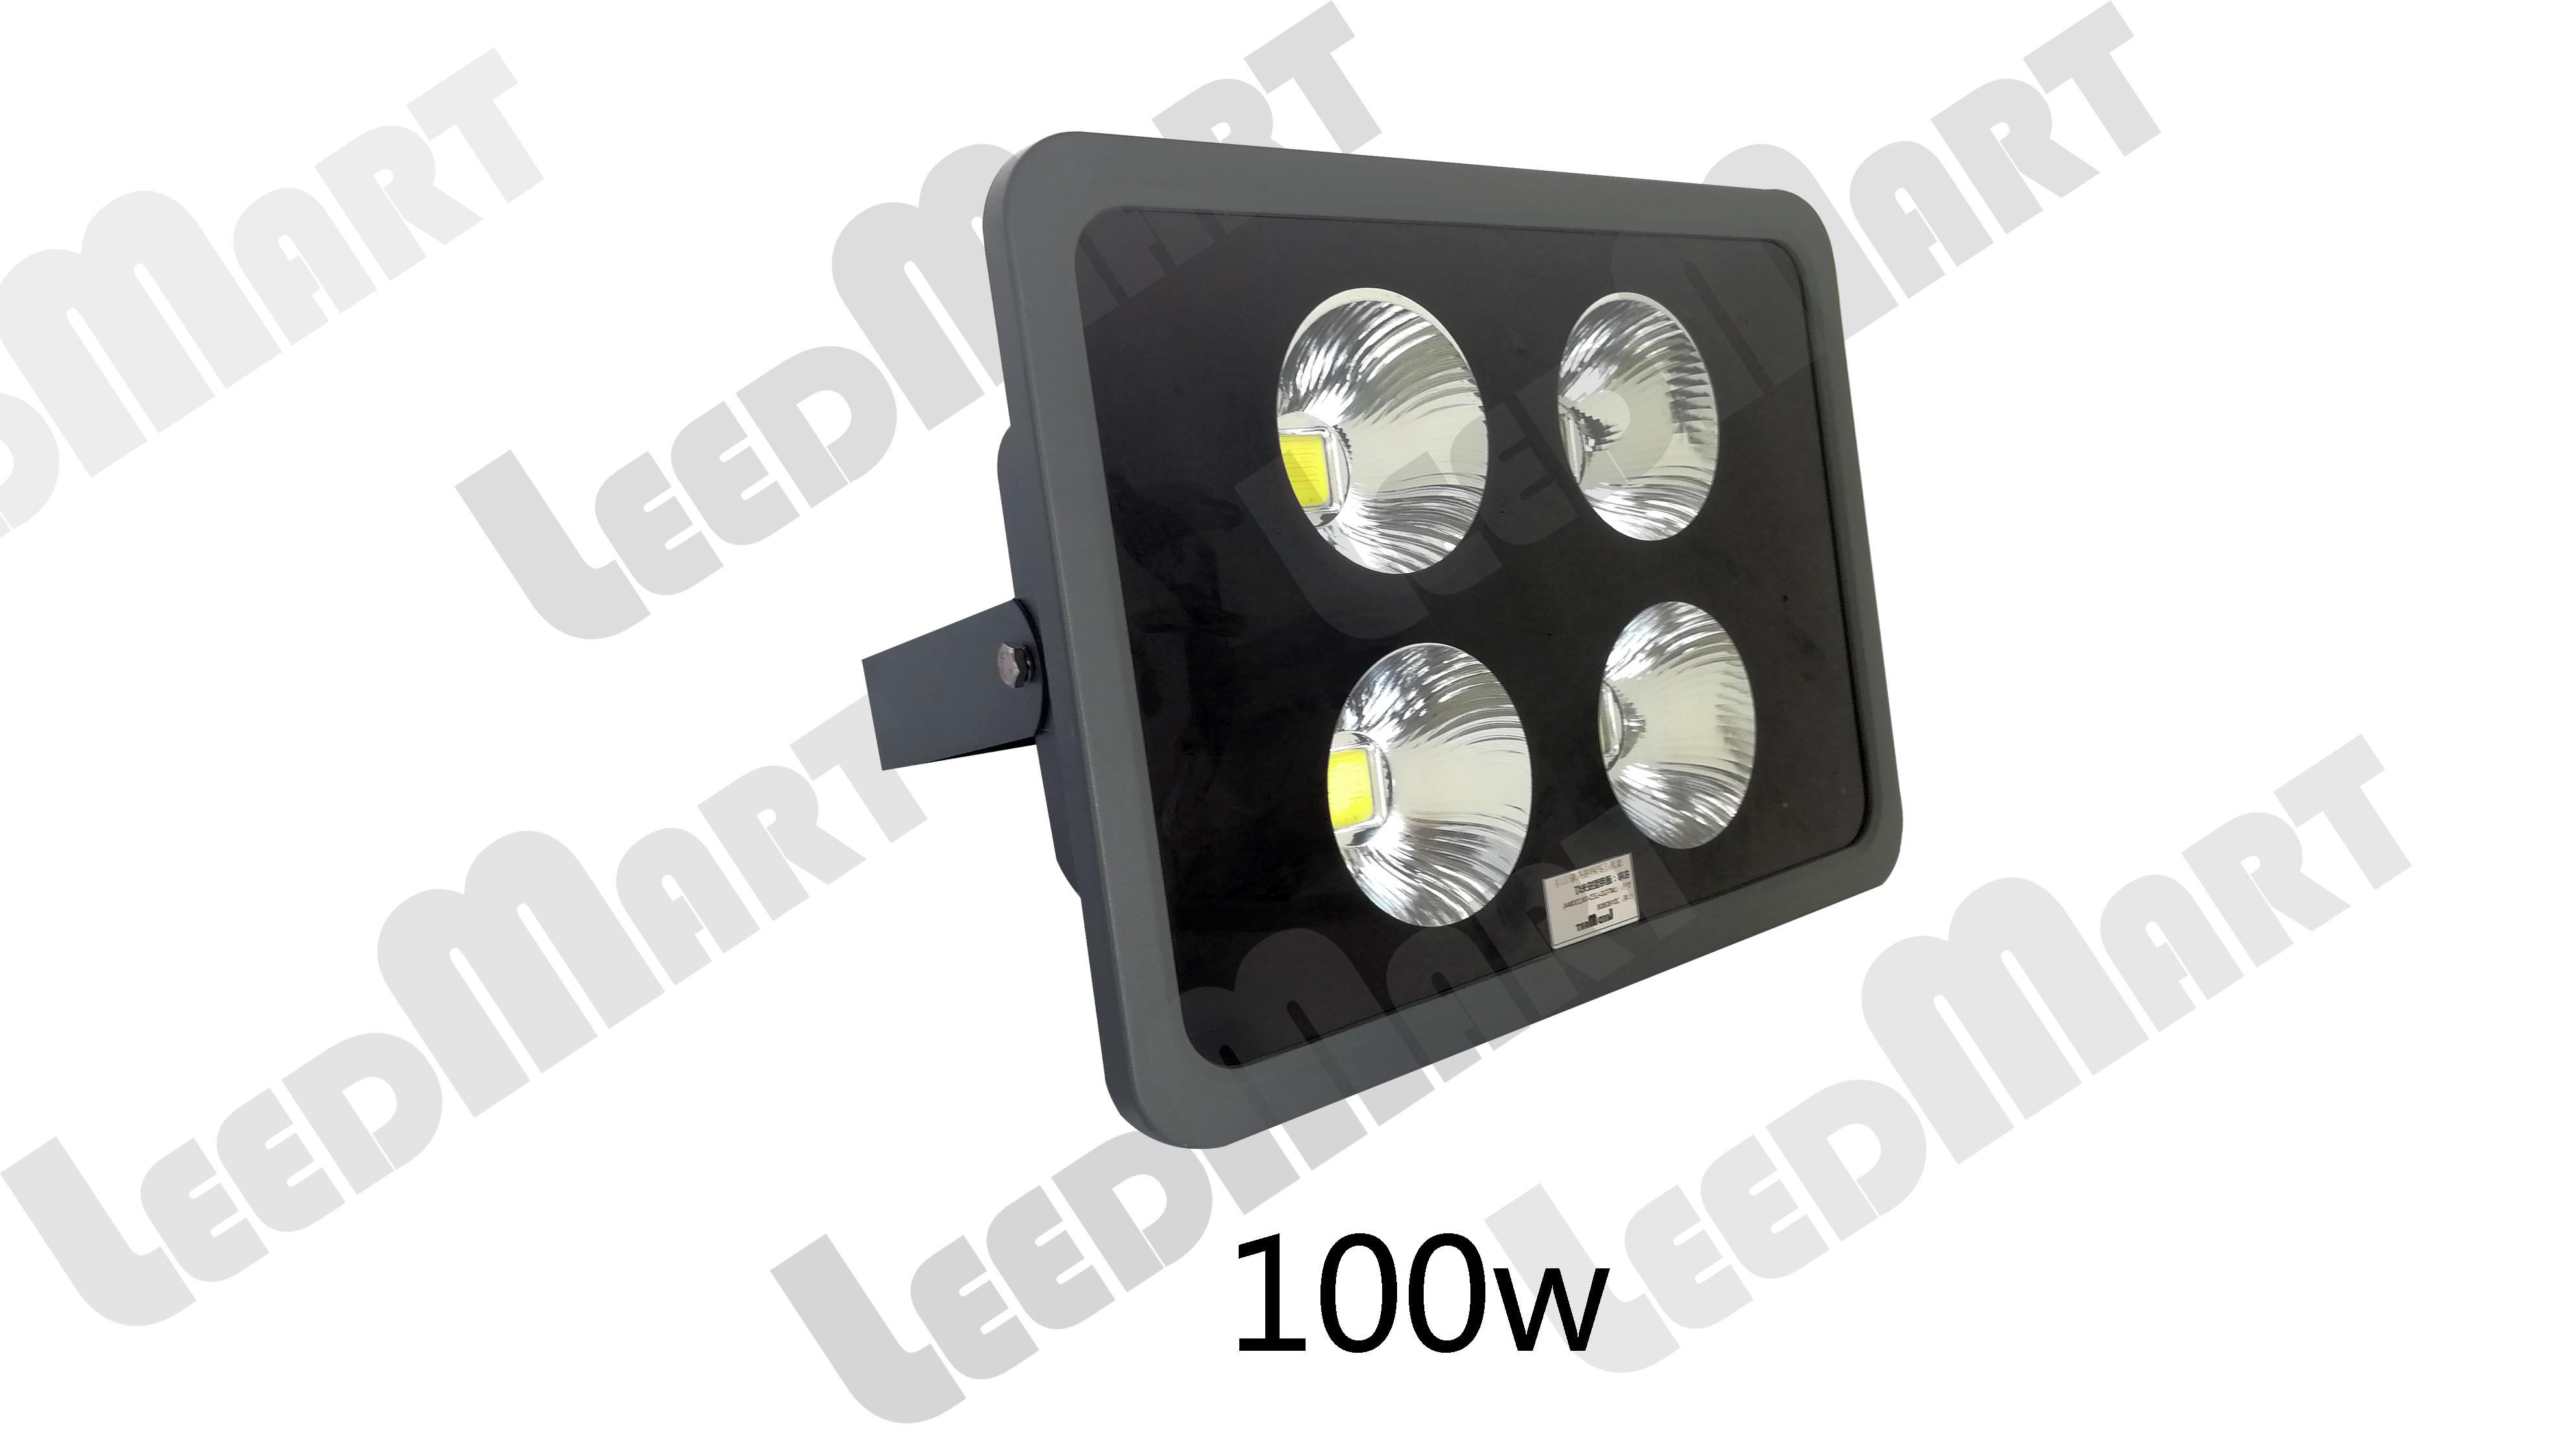 Good quality  IP65 50 watt -200 watt 24000 lumen LED flood light fixture with reflector cup